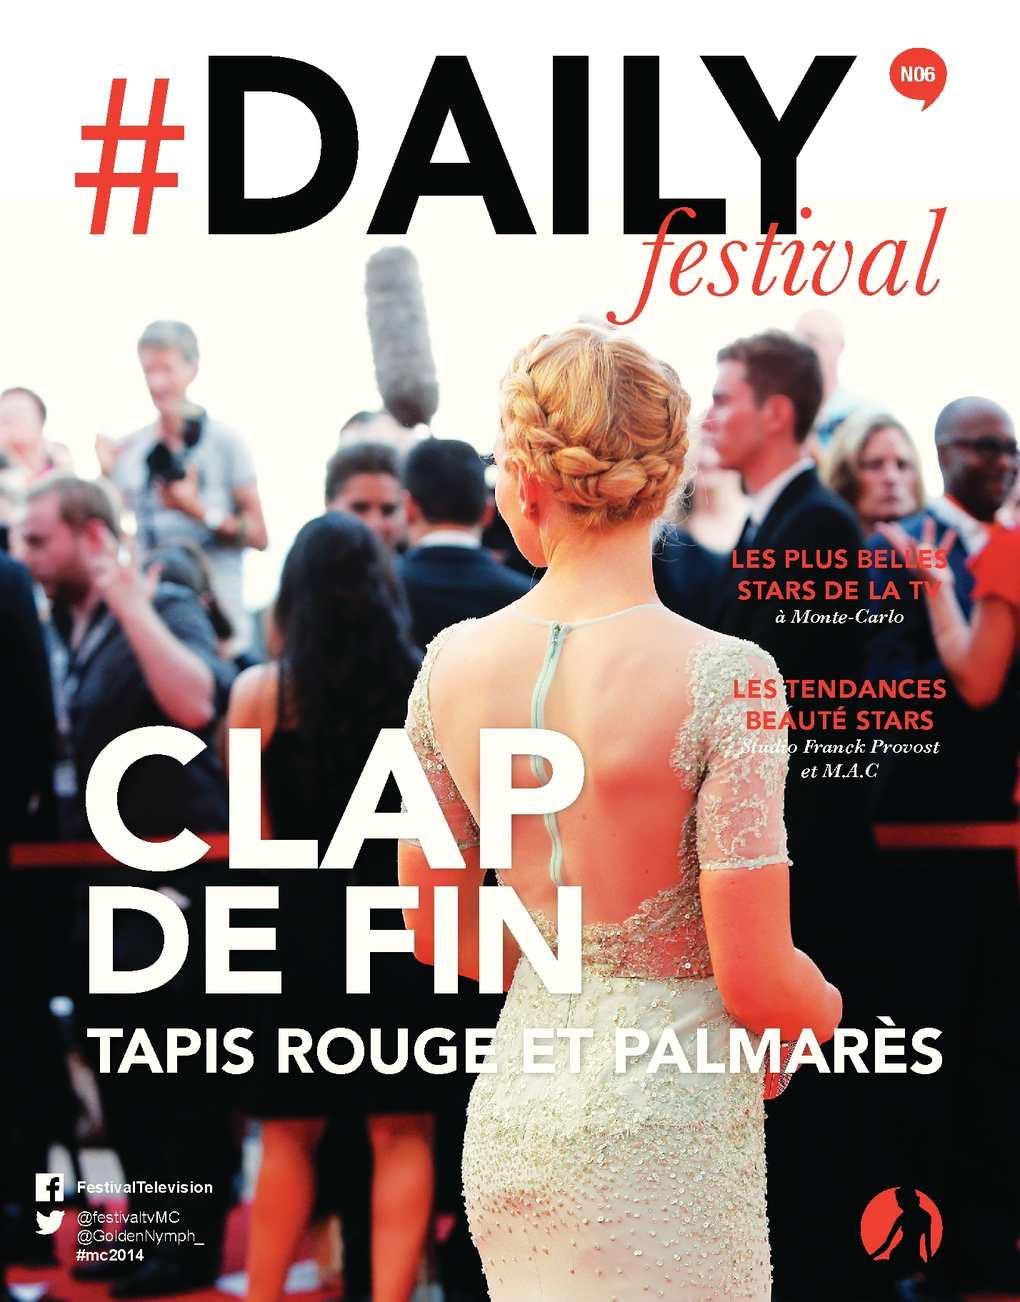 Greg Rikaart Nude inside calaméo - daily #06 - 2014